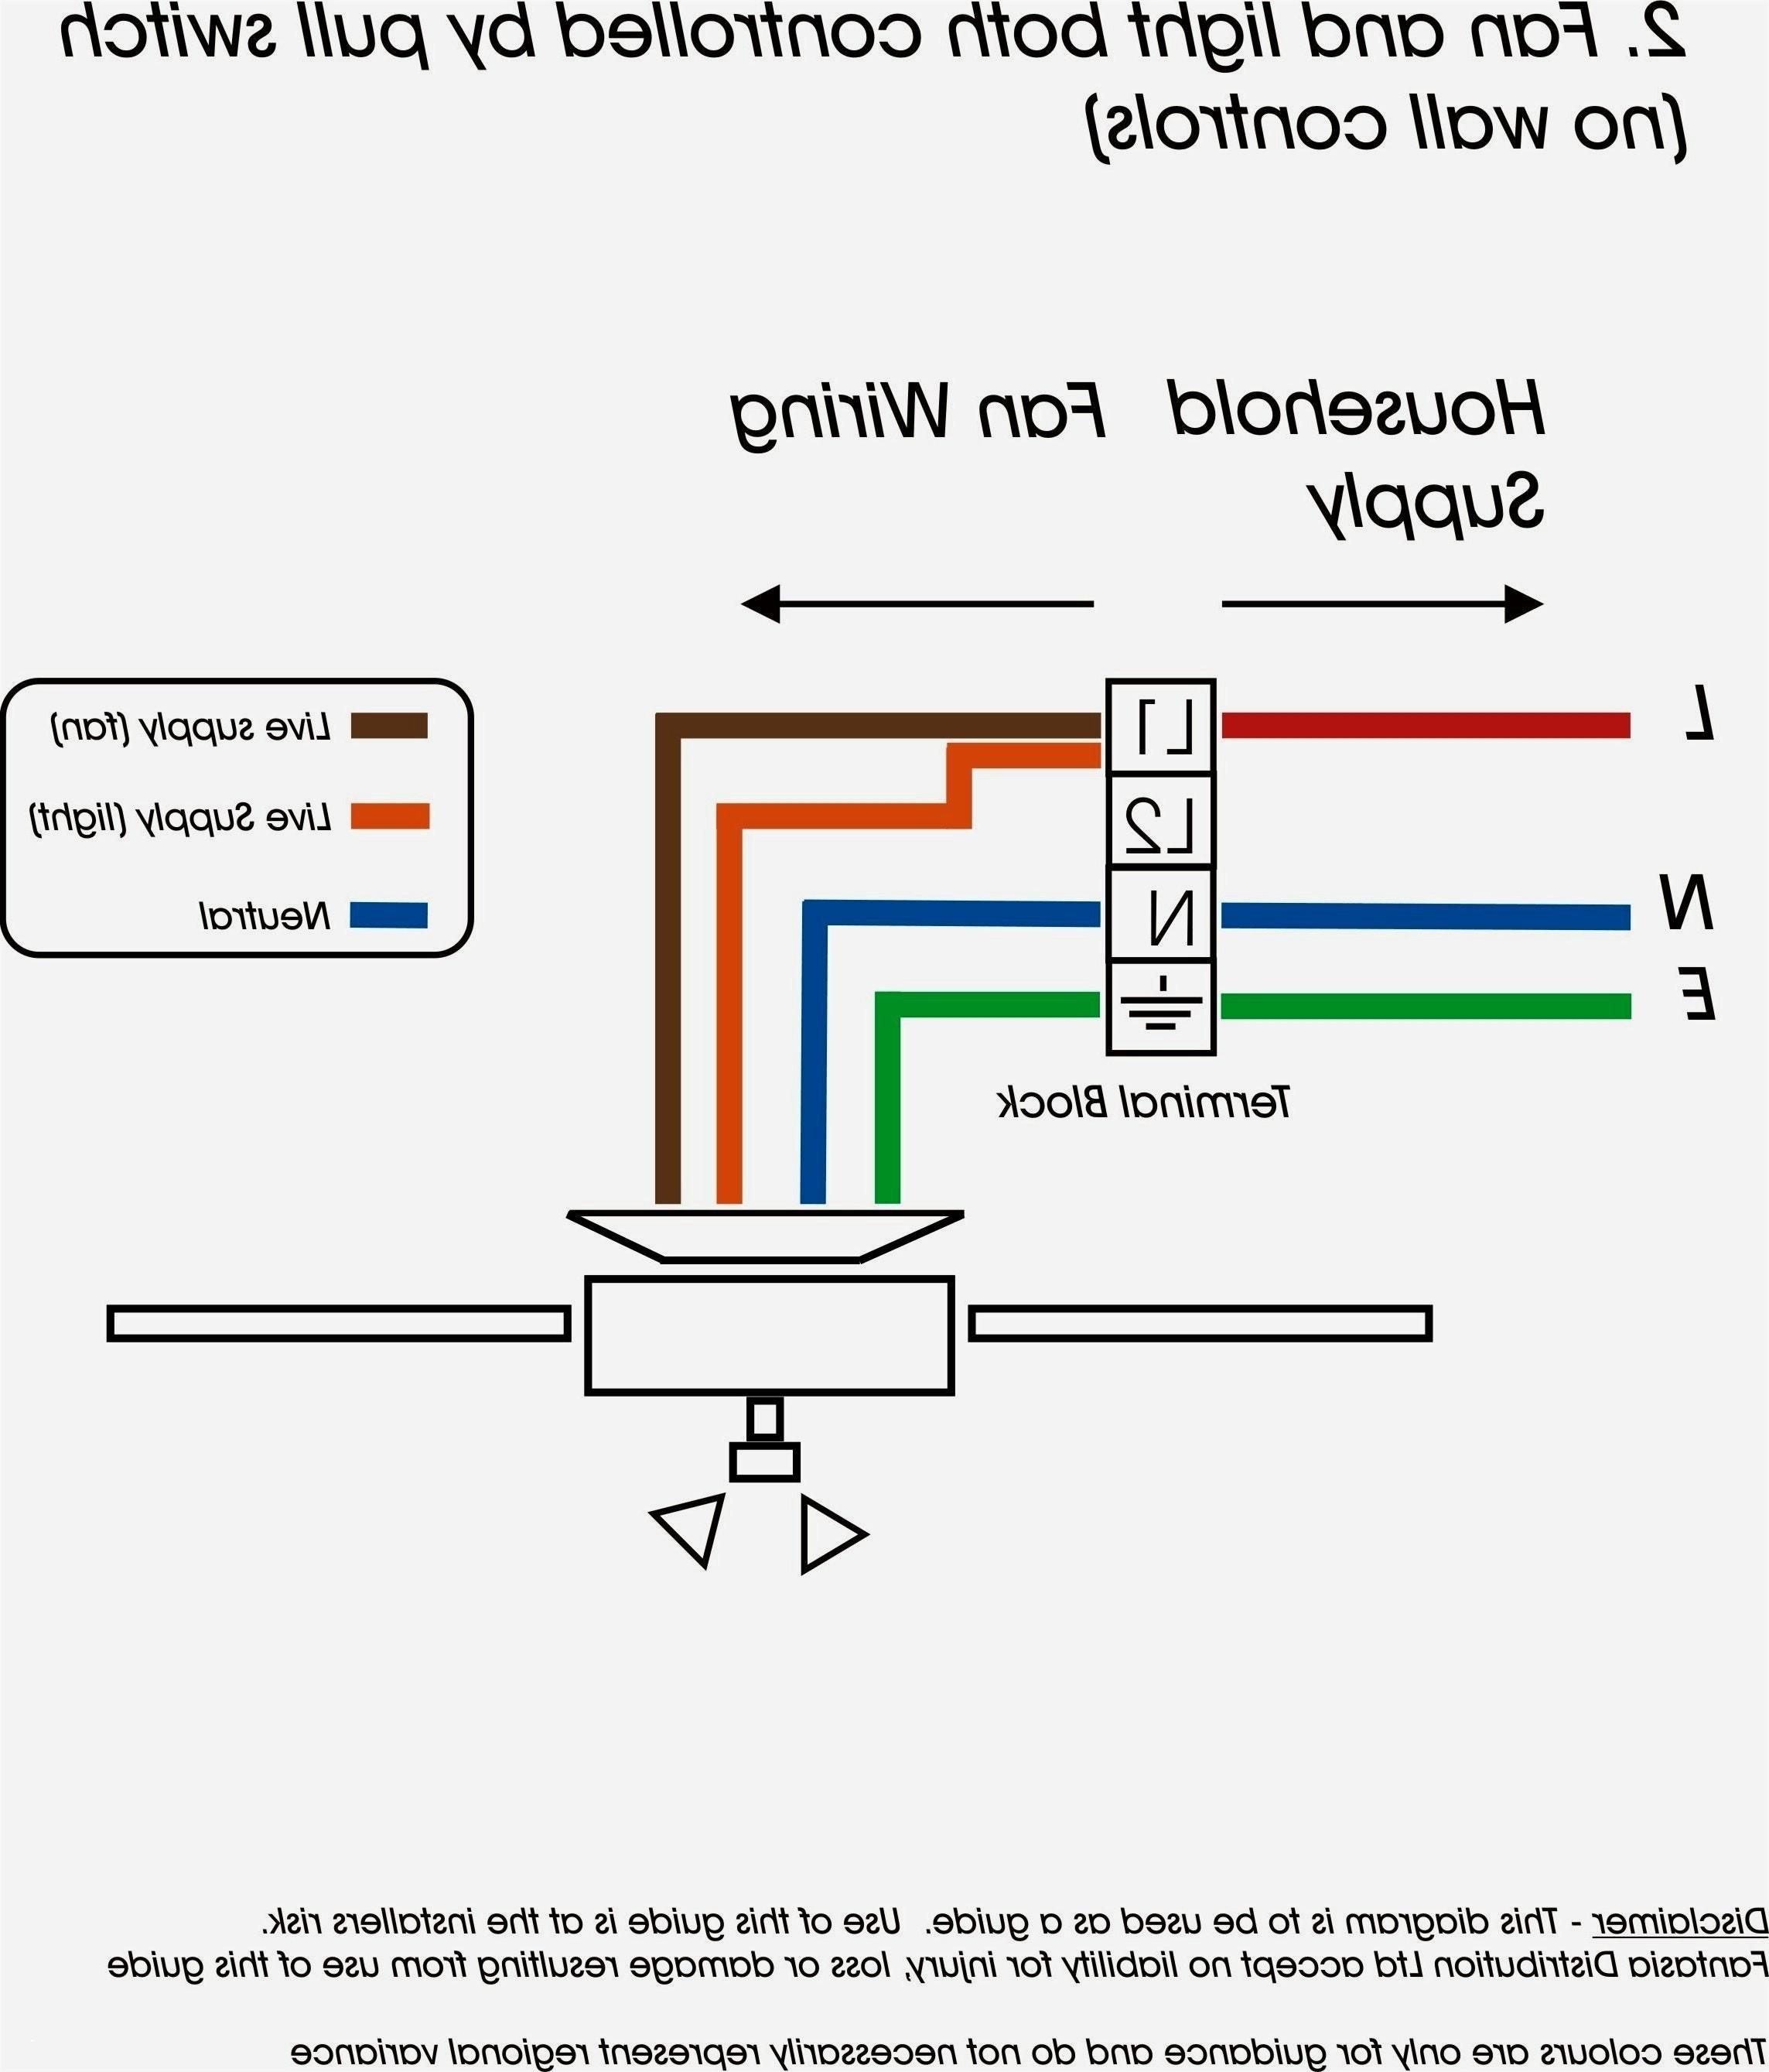 Fluorescent Light Fixture Parts Diagram R17d 8 Foot Led ... on